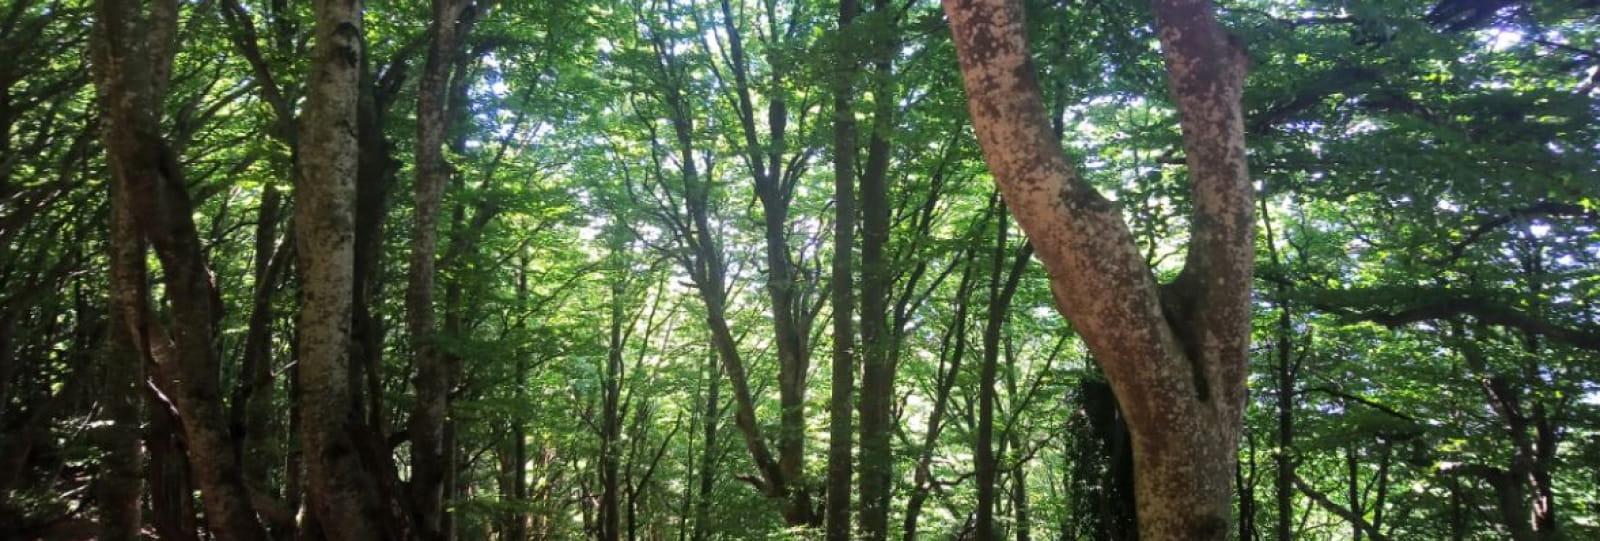 Bains de forêt ou Shinrin-yoku